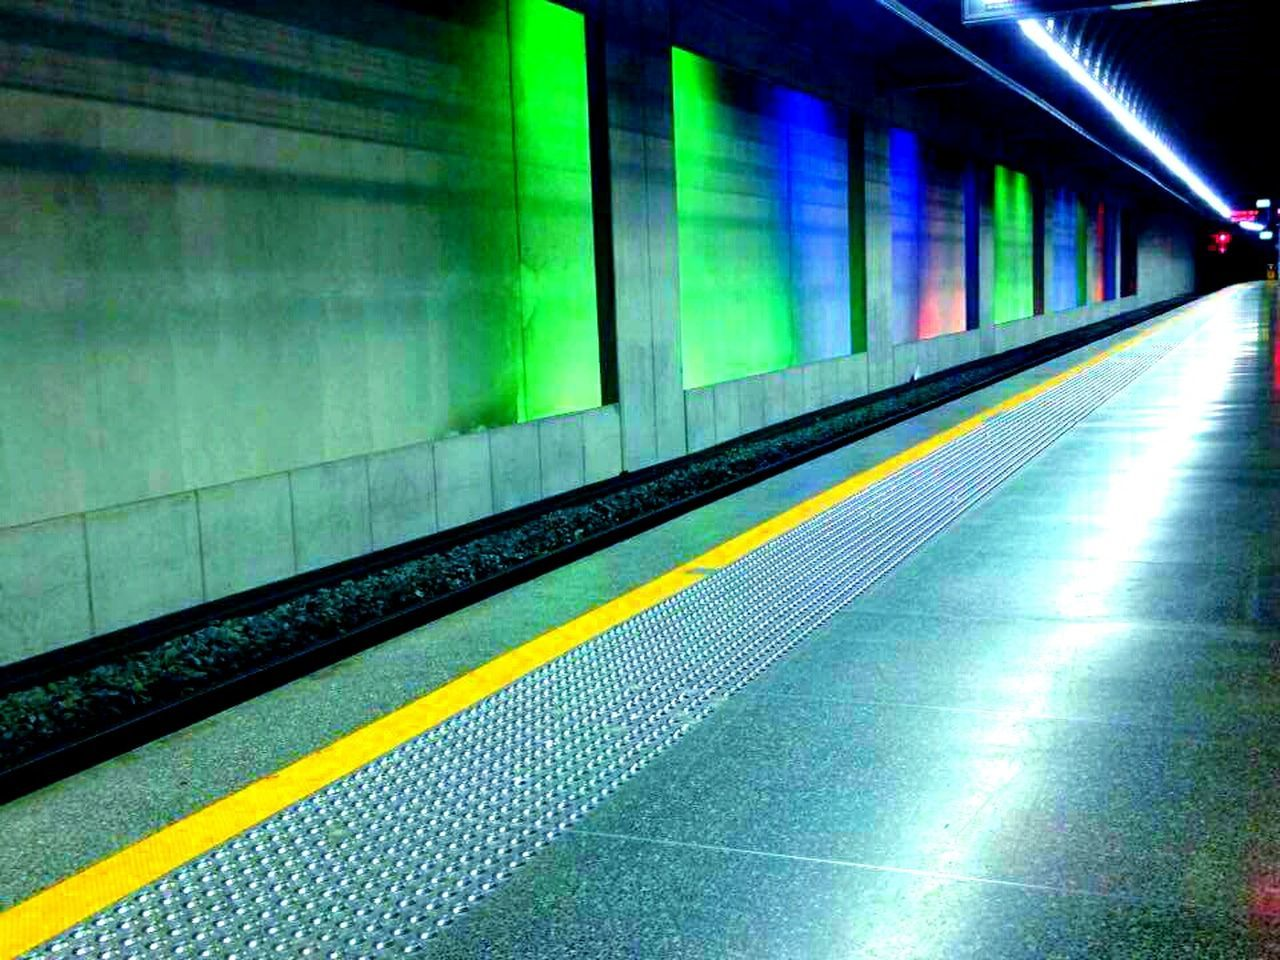 illuminated, subway station, transportation, speed, railroad track, multi colored, station, indoors, night, subway train, no people, architecture, technology, neon, city